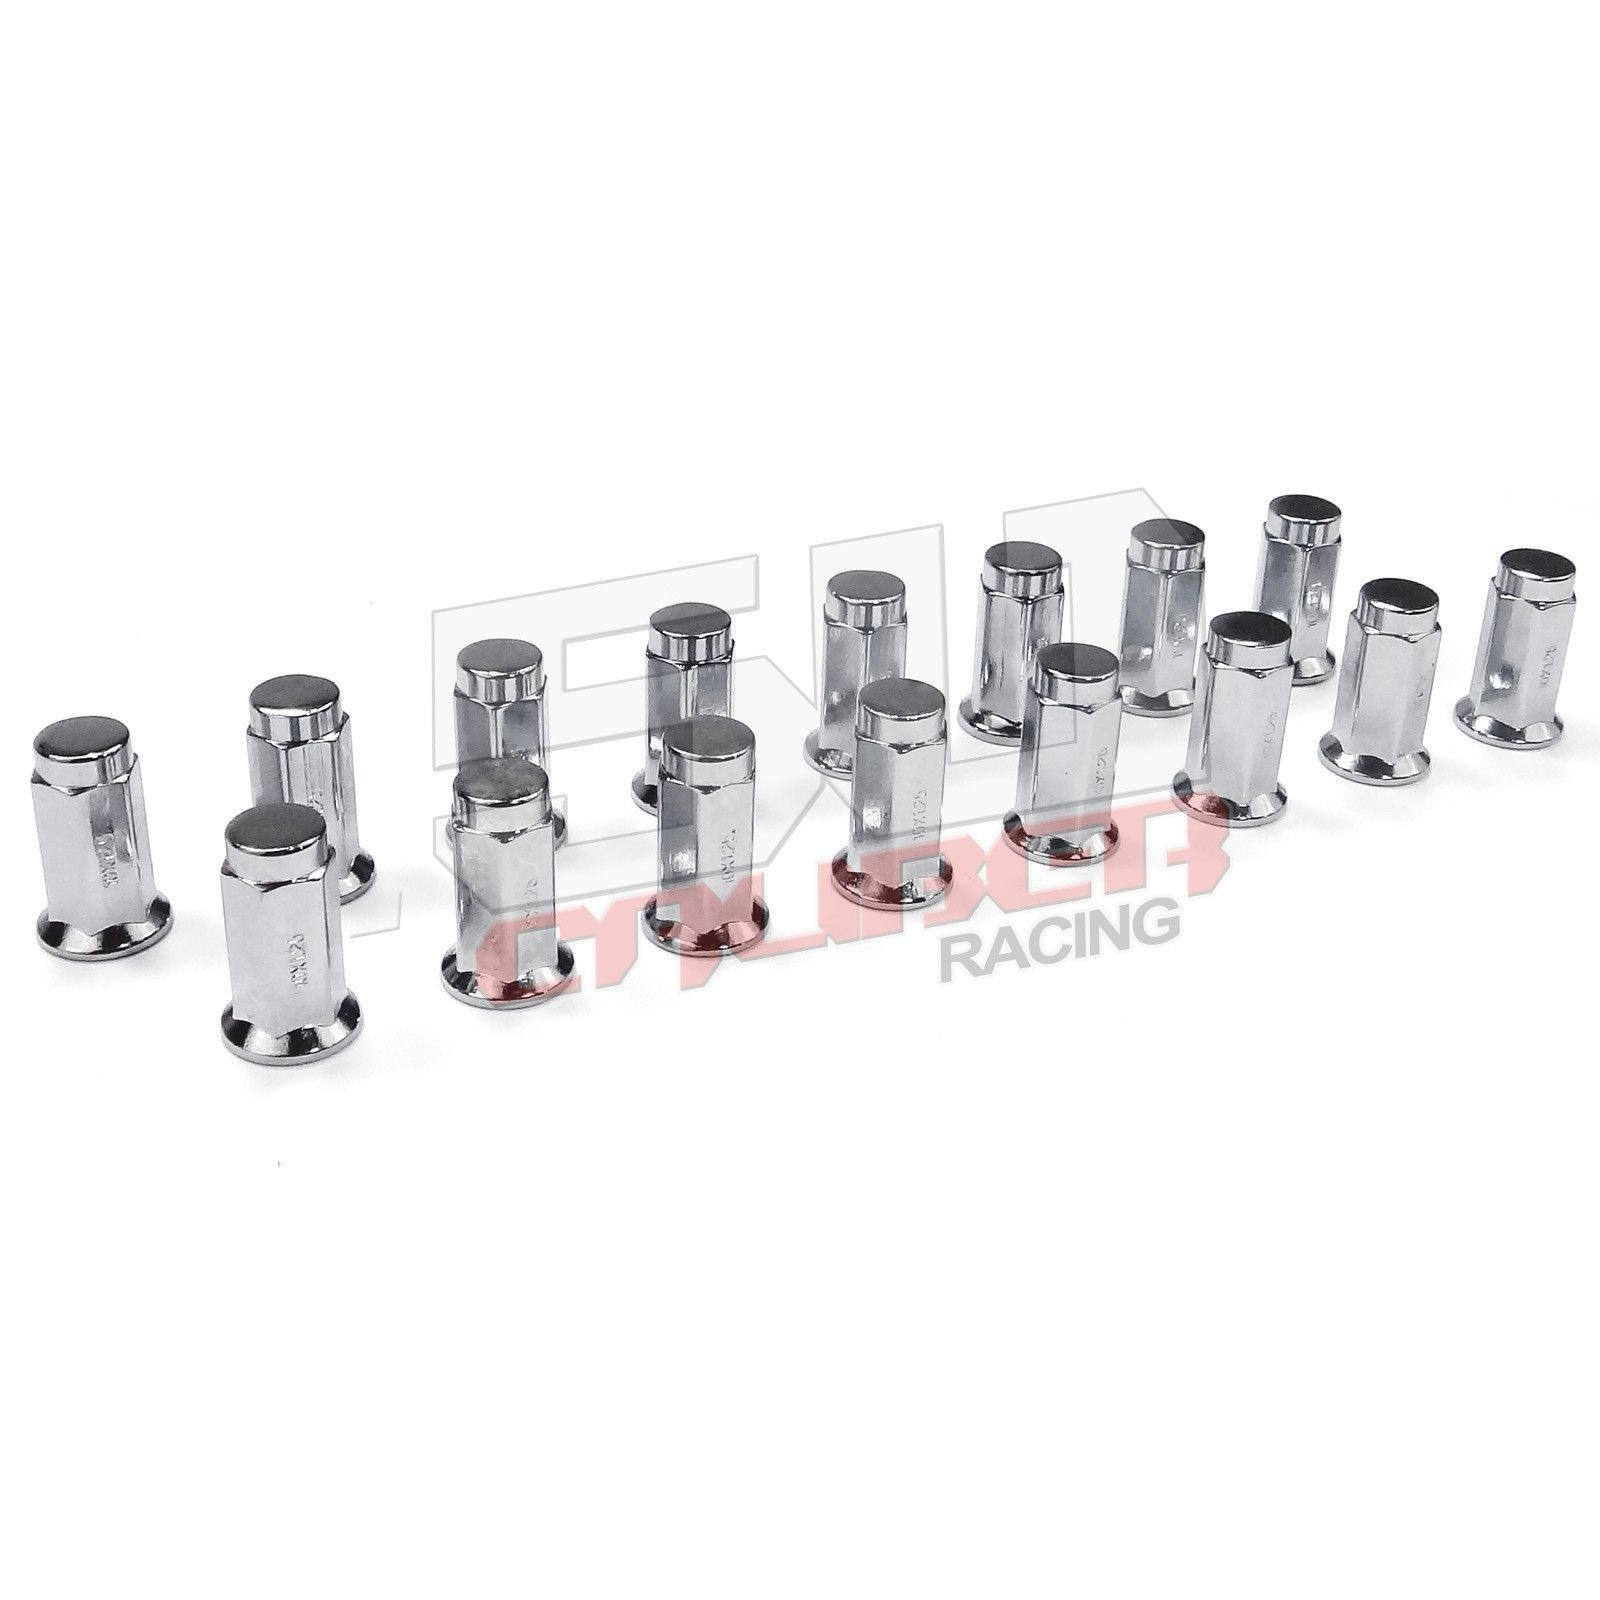 16 Chrome Flat Lug Nuts 12x1 25 Kawasaki Teryx Mule